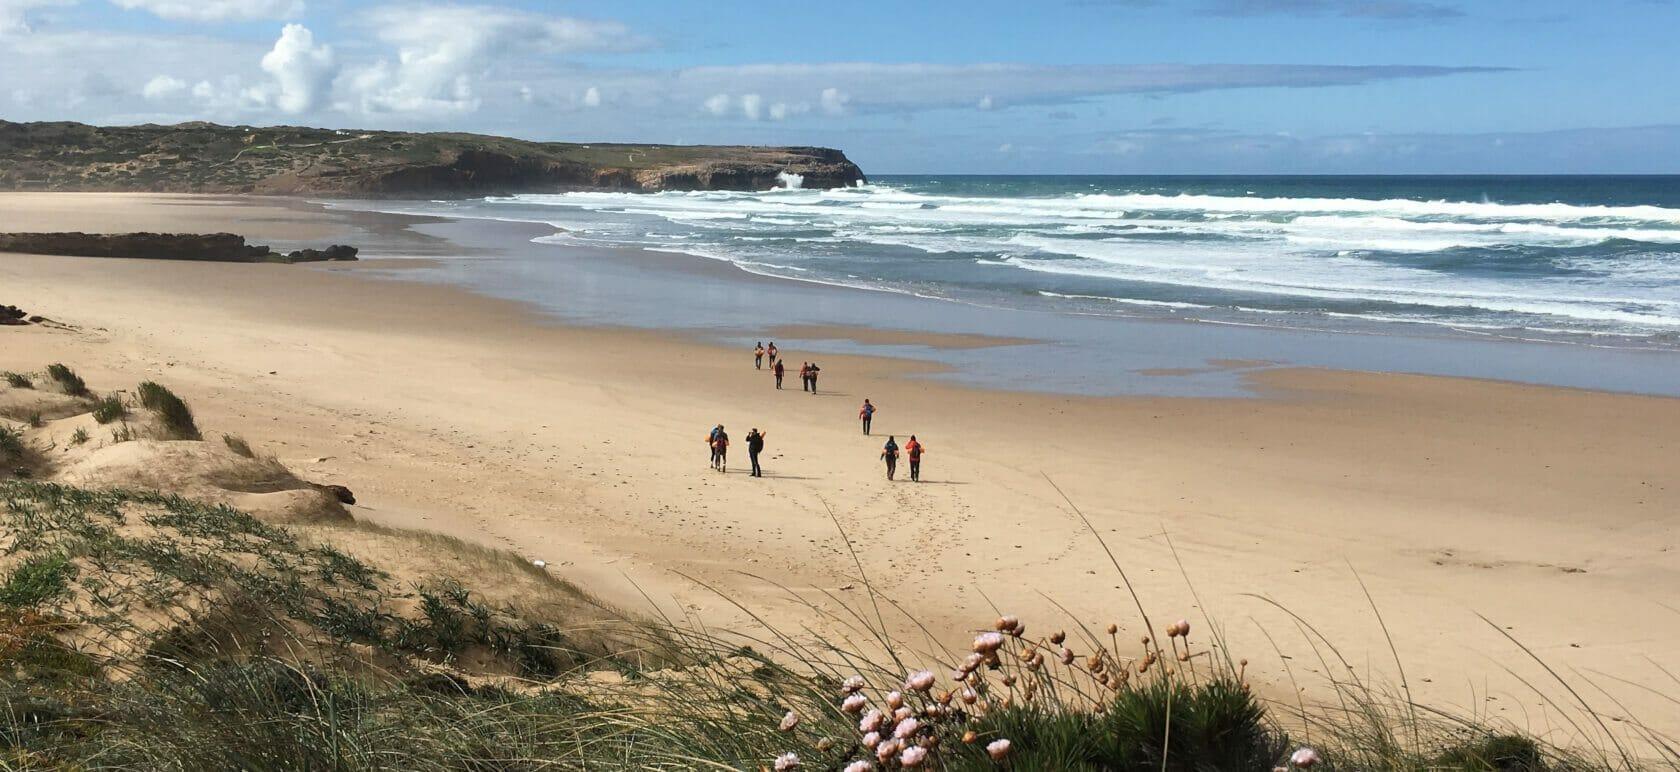 Dünenmeer im Blütenrausch – faszinierende Westküste